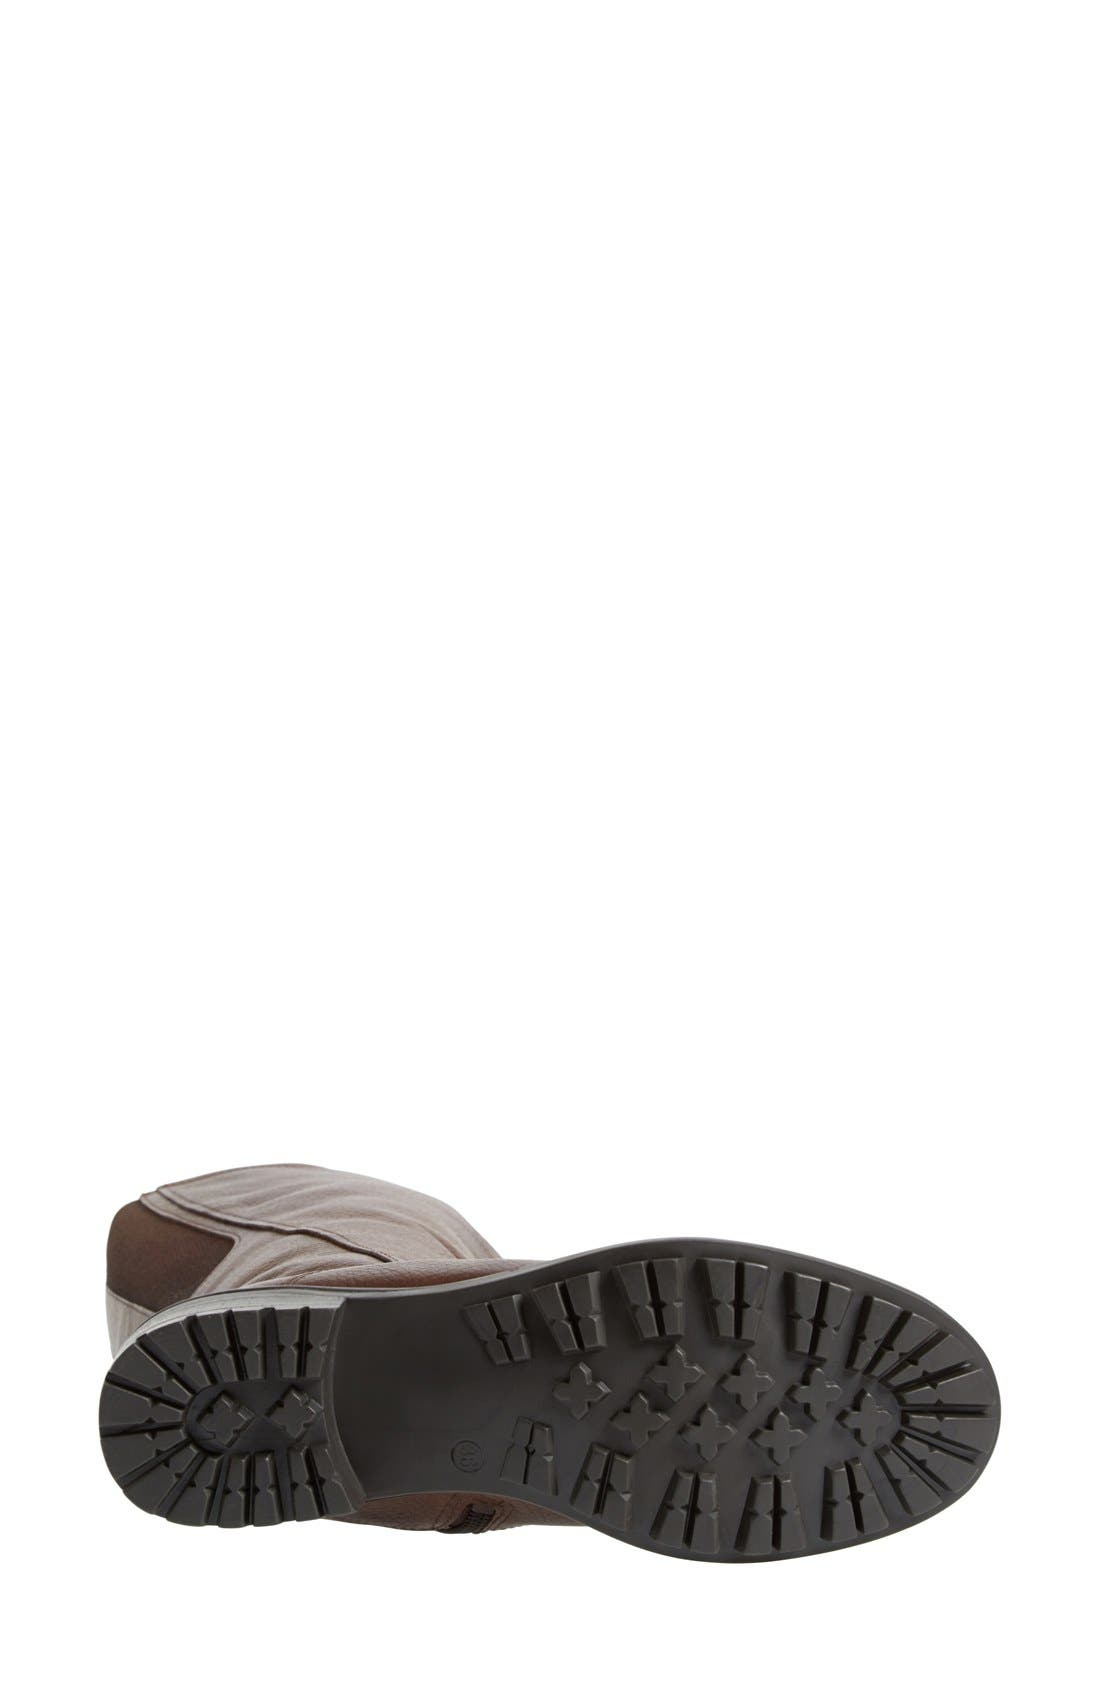 'Andrea' Waterproof Boot,                             Alternate thumbnail 5, color,                             Brown Pebbled Leather Regular